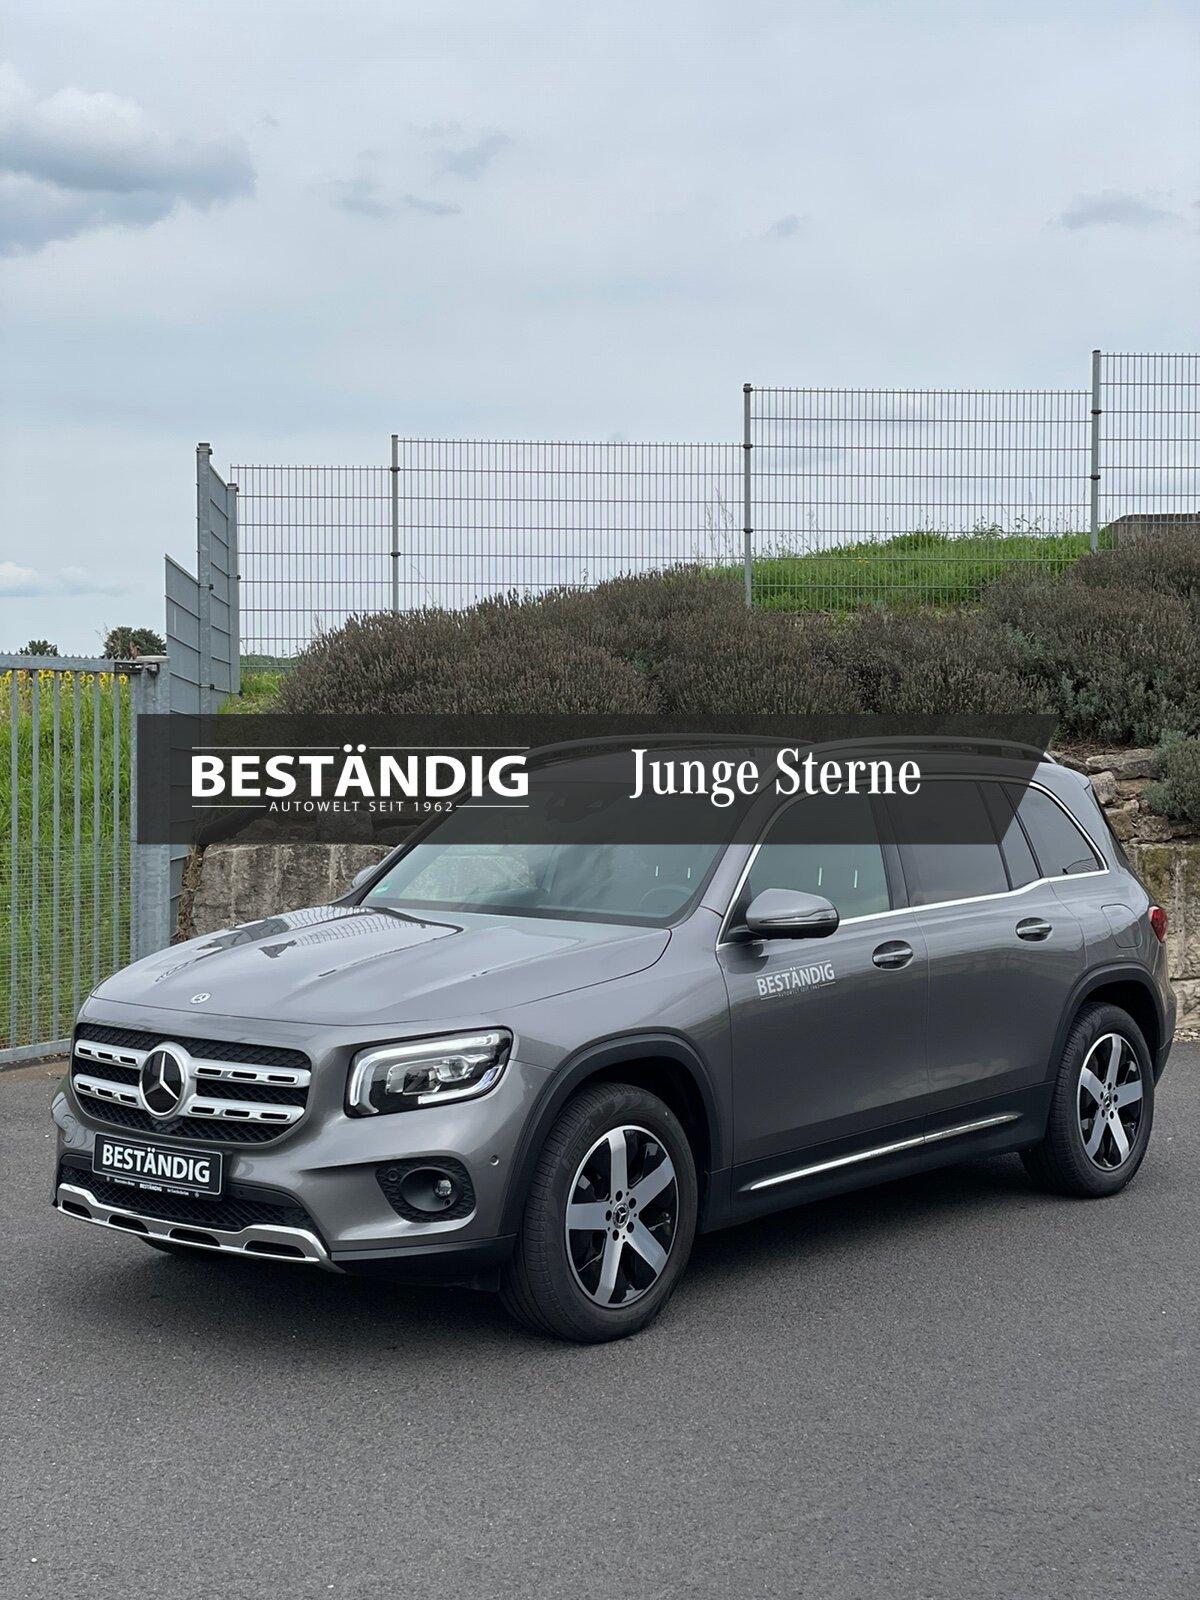 Mercedes-Benz GLB 200d PROGRESSIVE*MBUX*FAHRASS*PDC*KAMERA*DAB, Jahr 2019, Diesel